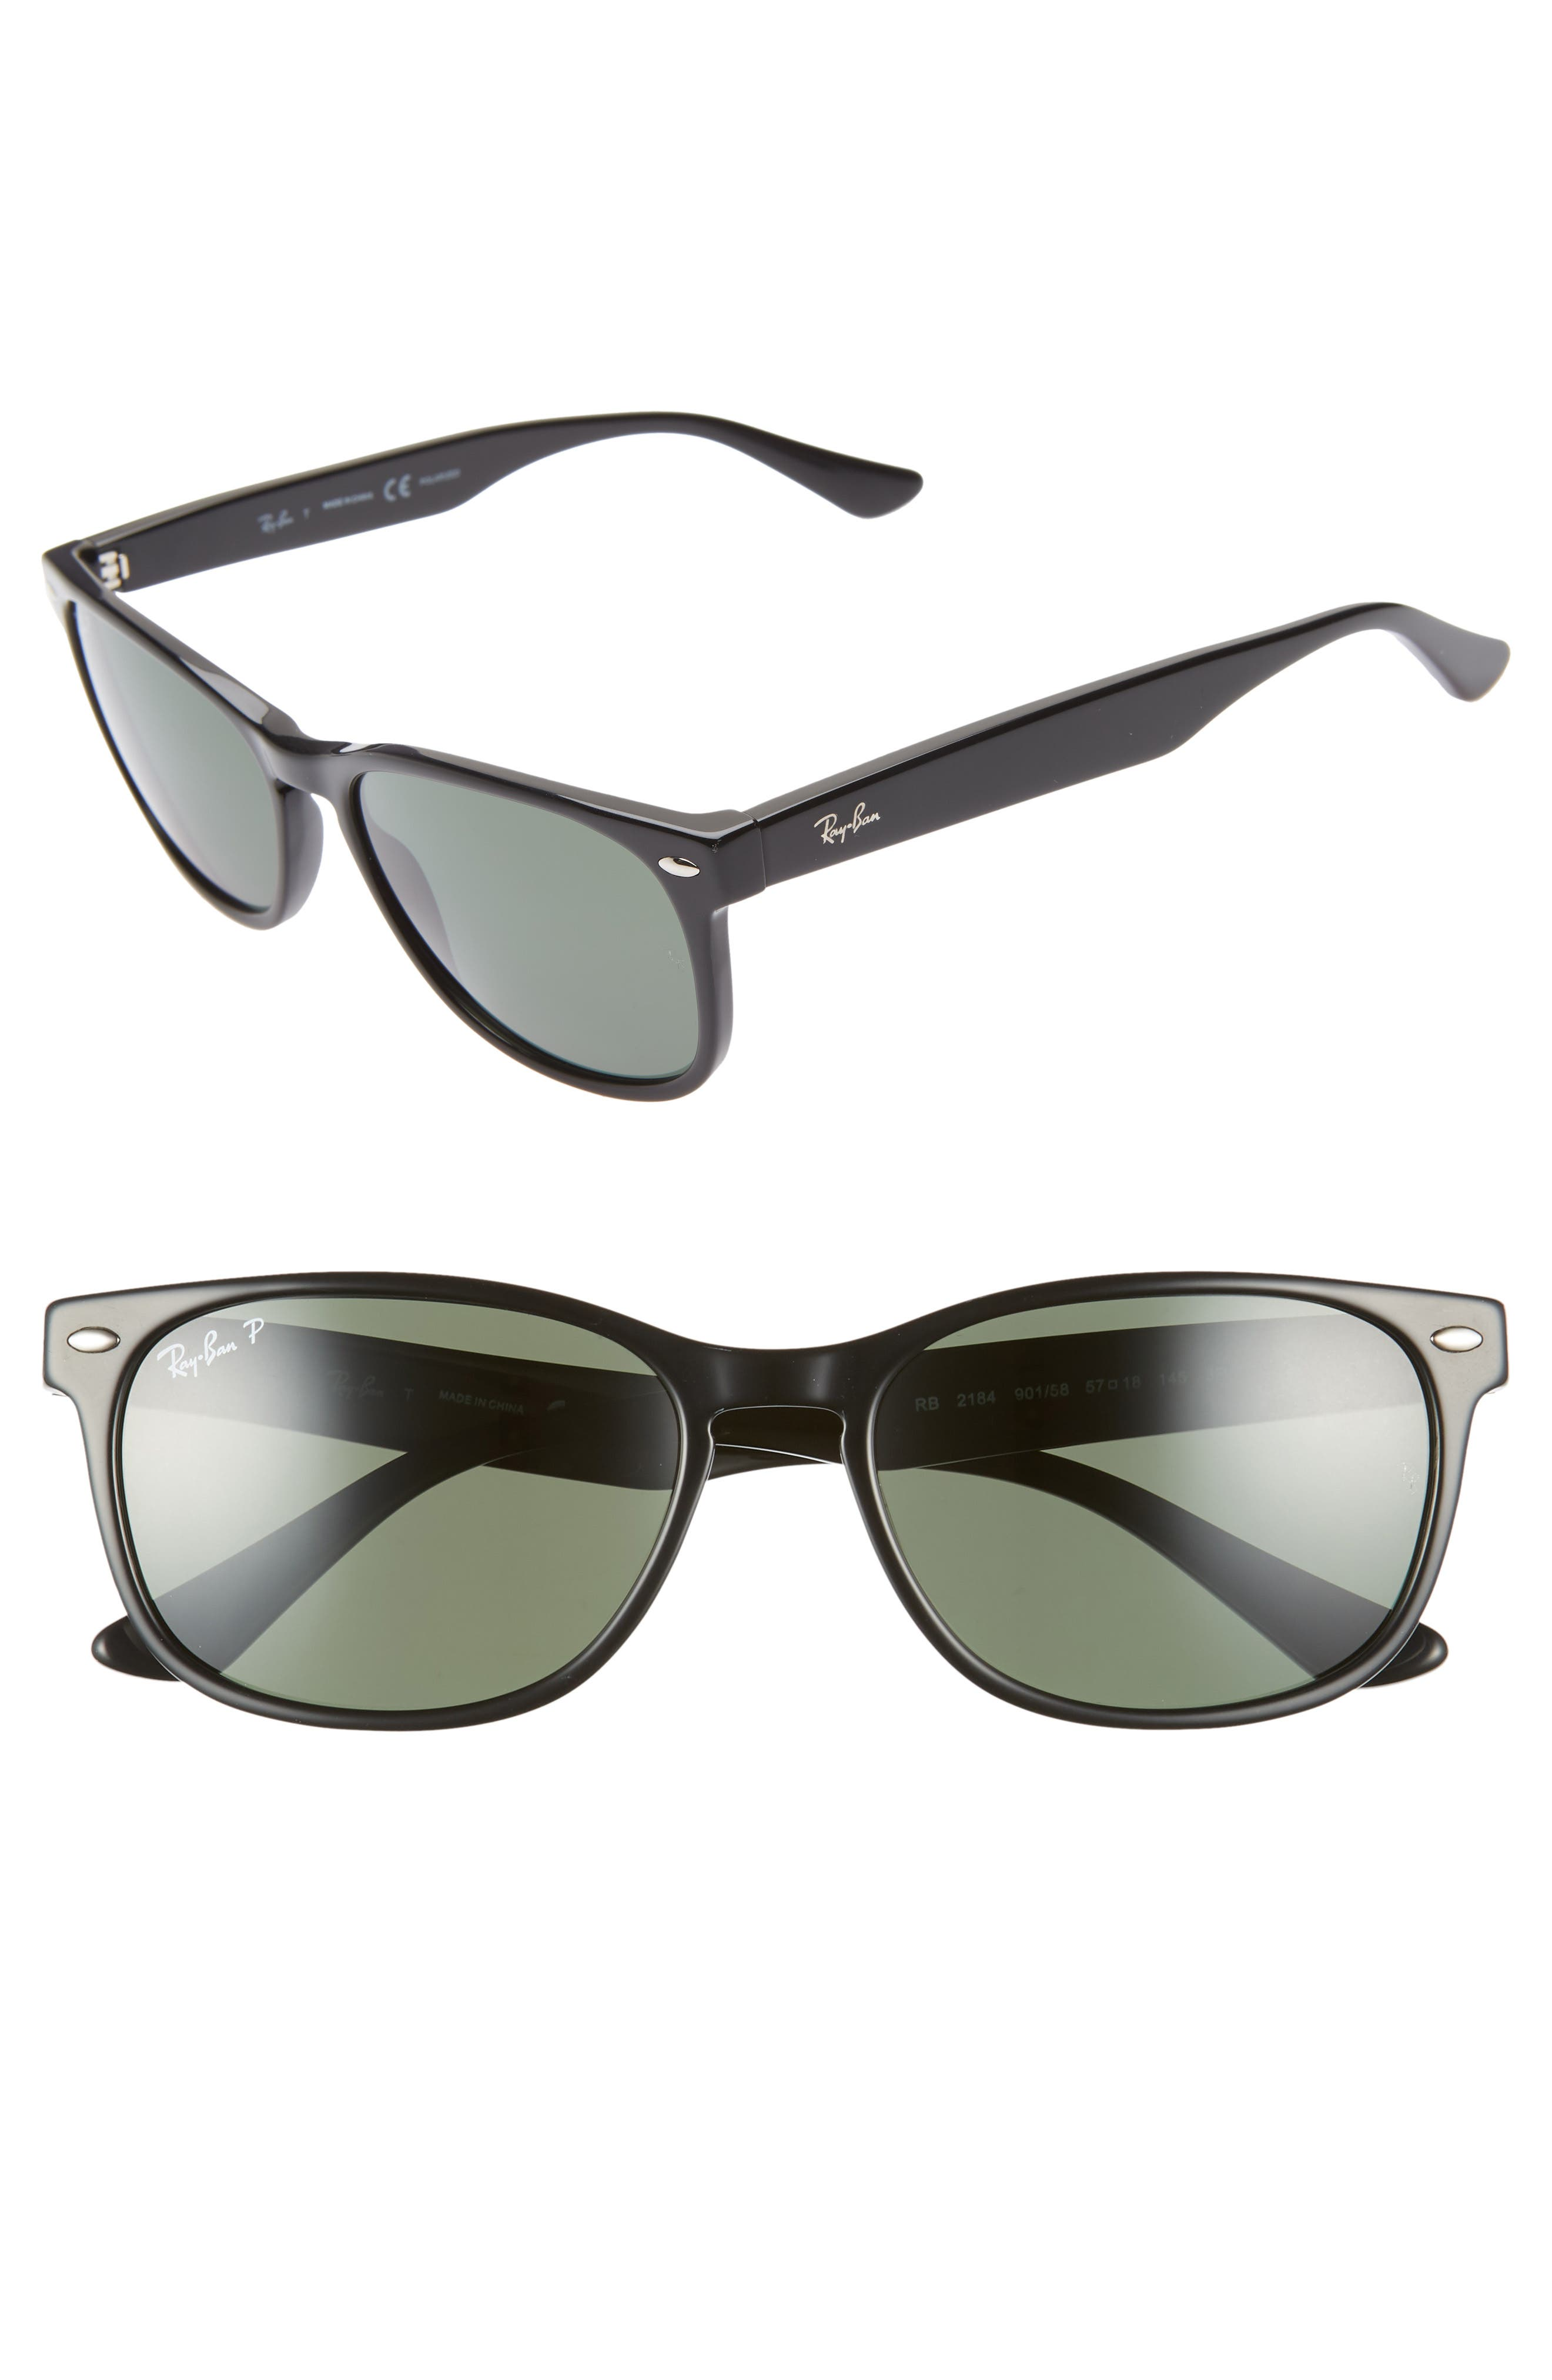 57mm Wayfarer Polarized Sunglasses,                         Main,                         color, BLACK/ GREEN SOLID